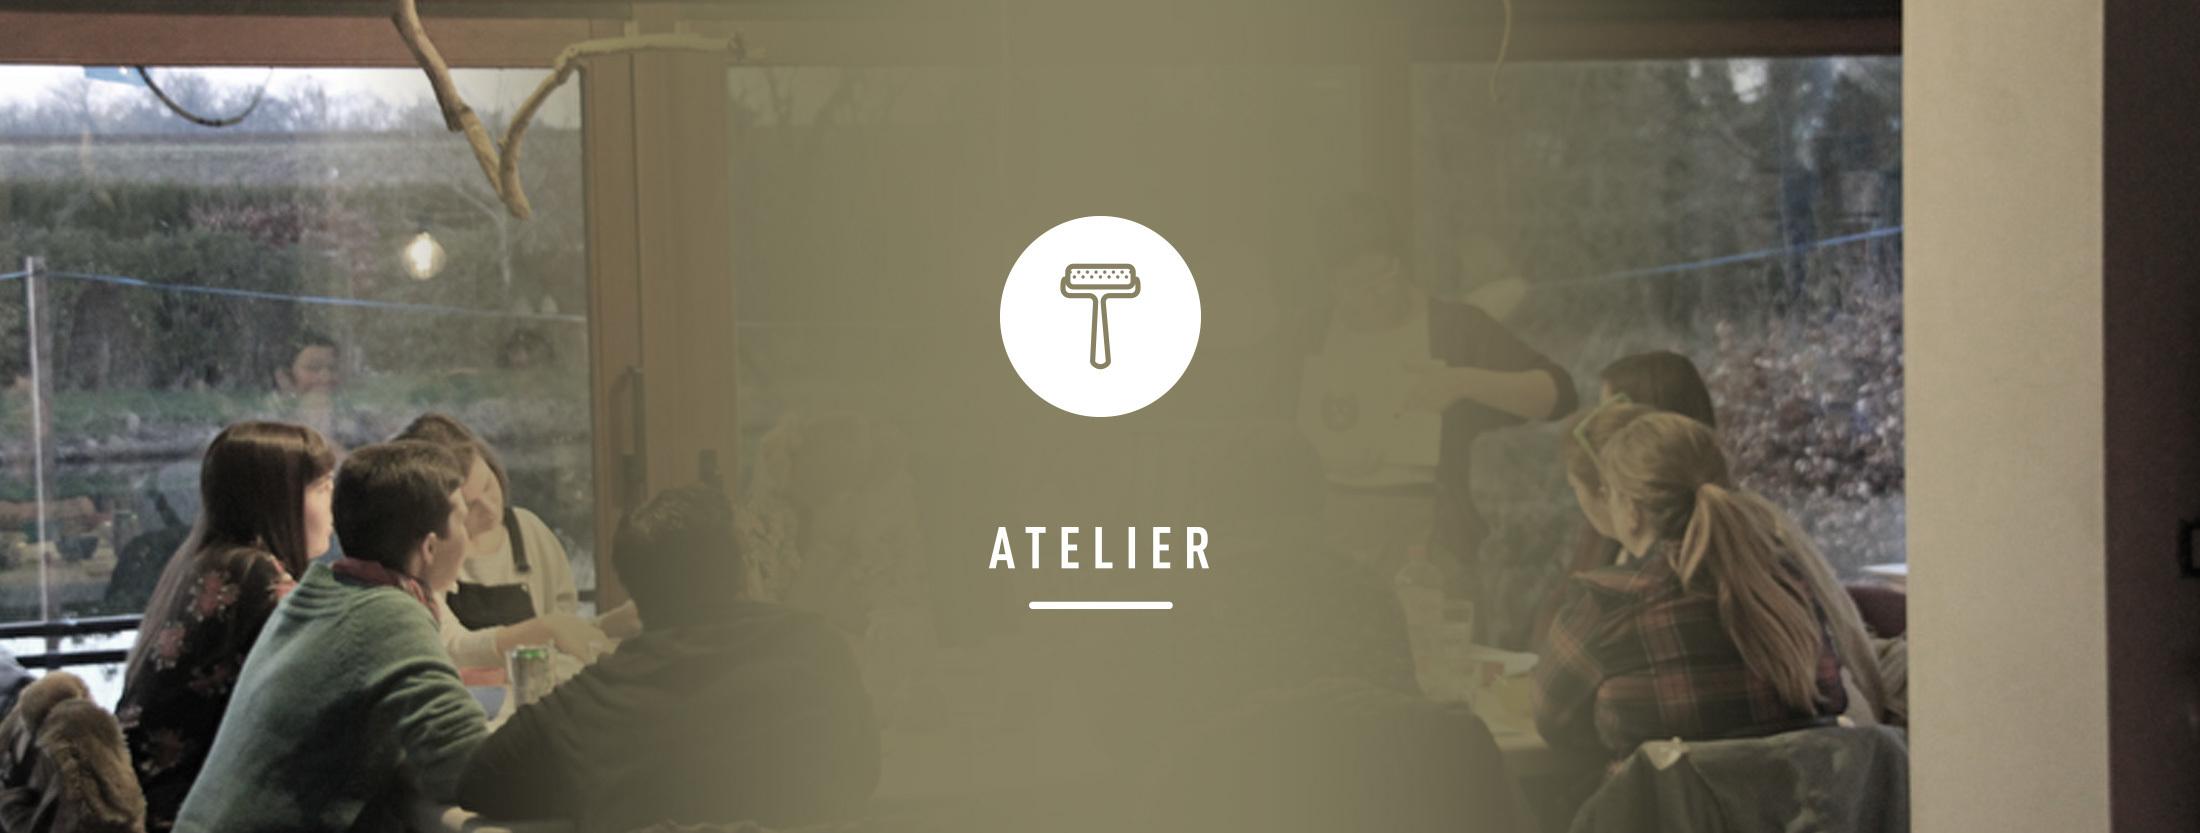 Atelier Arthur - Atelier